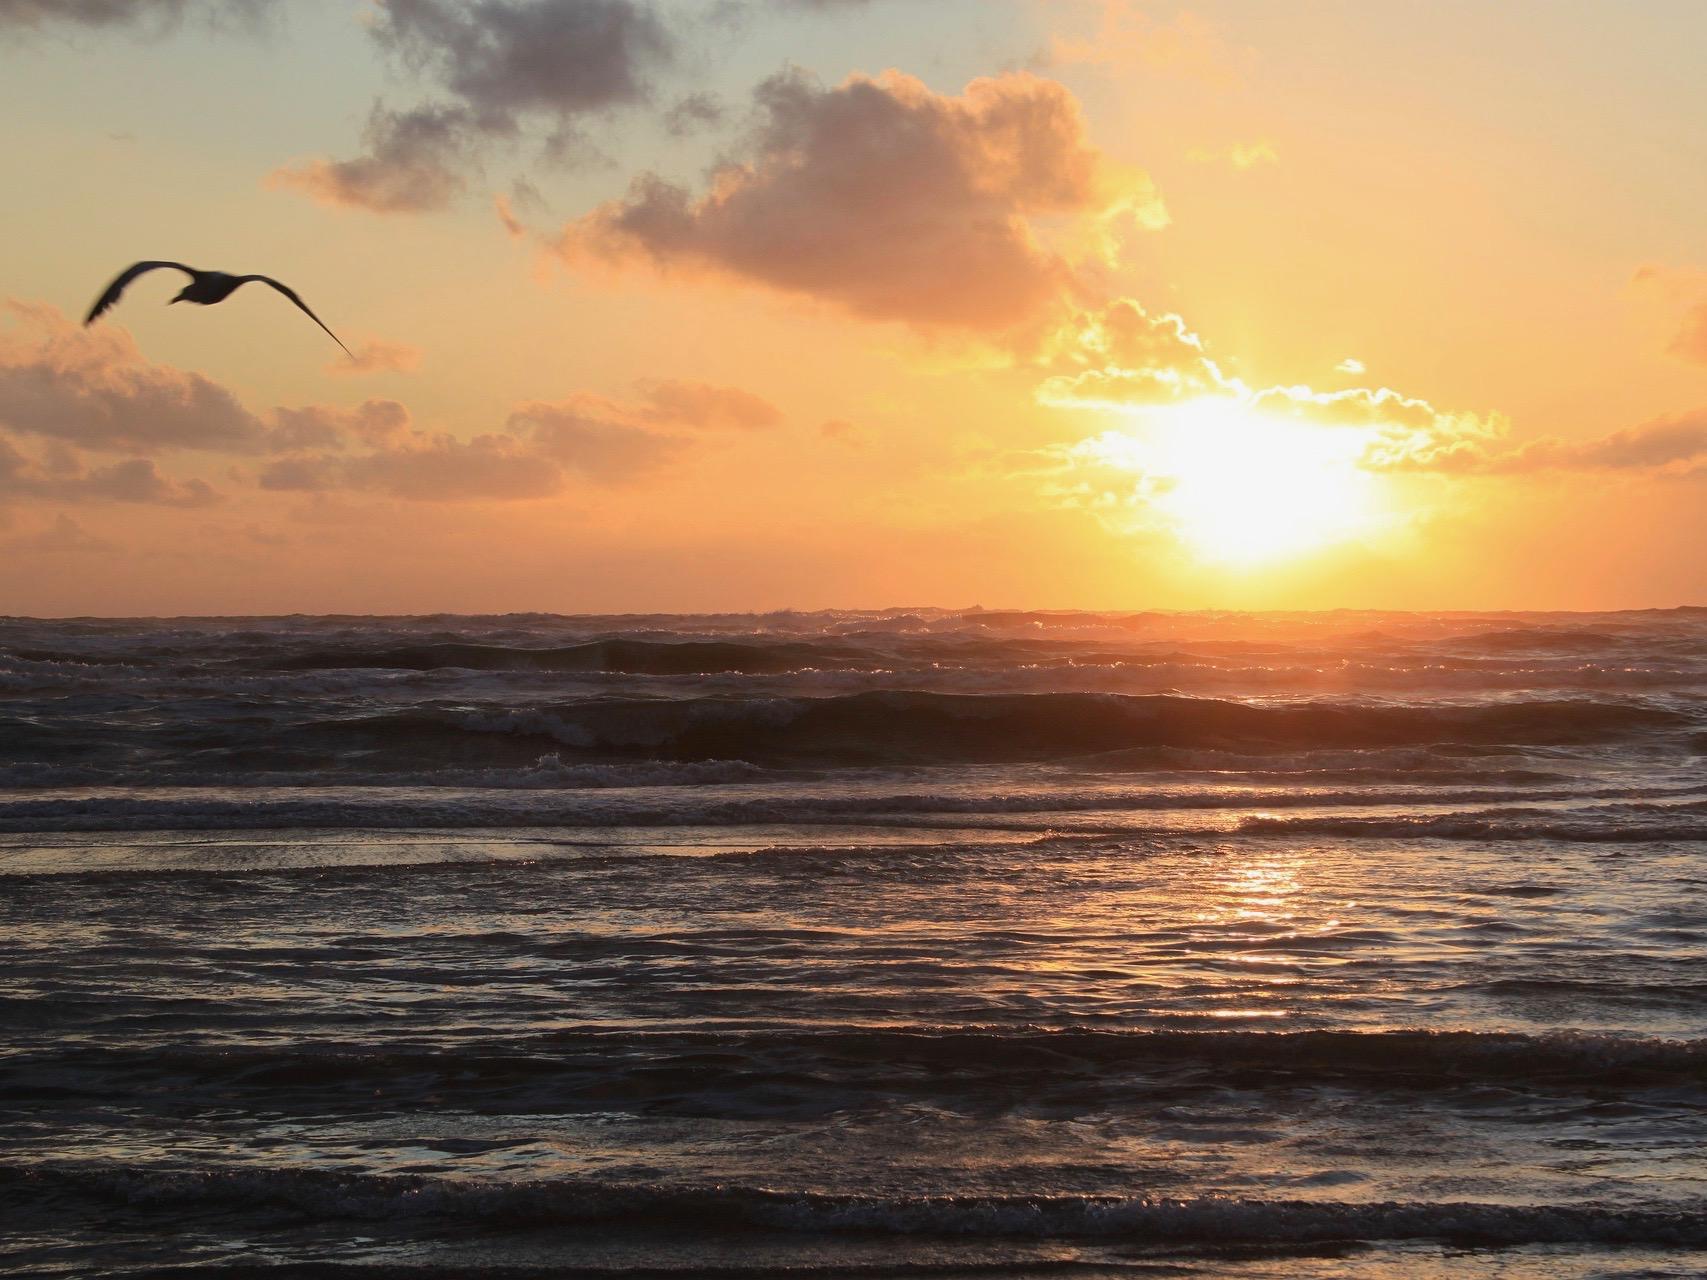 Kitesurflessen in Zandvoort leren kiten kitesurfcursus goedkoop